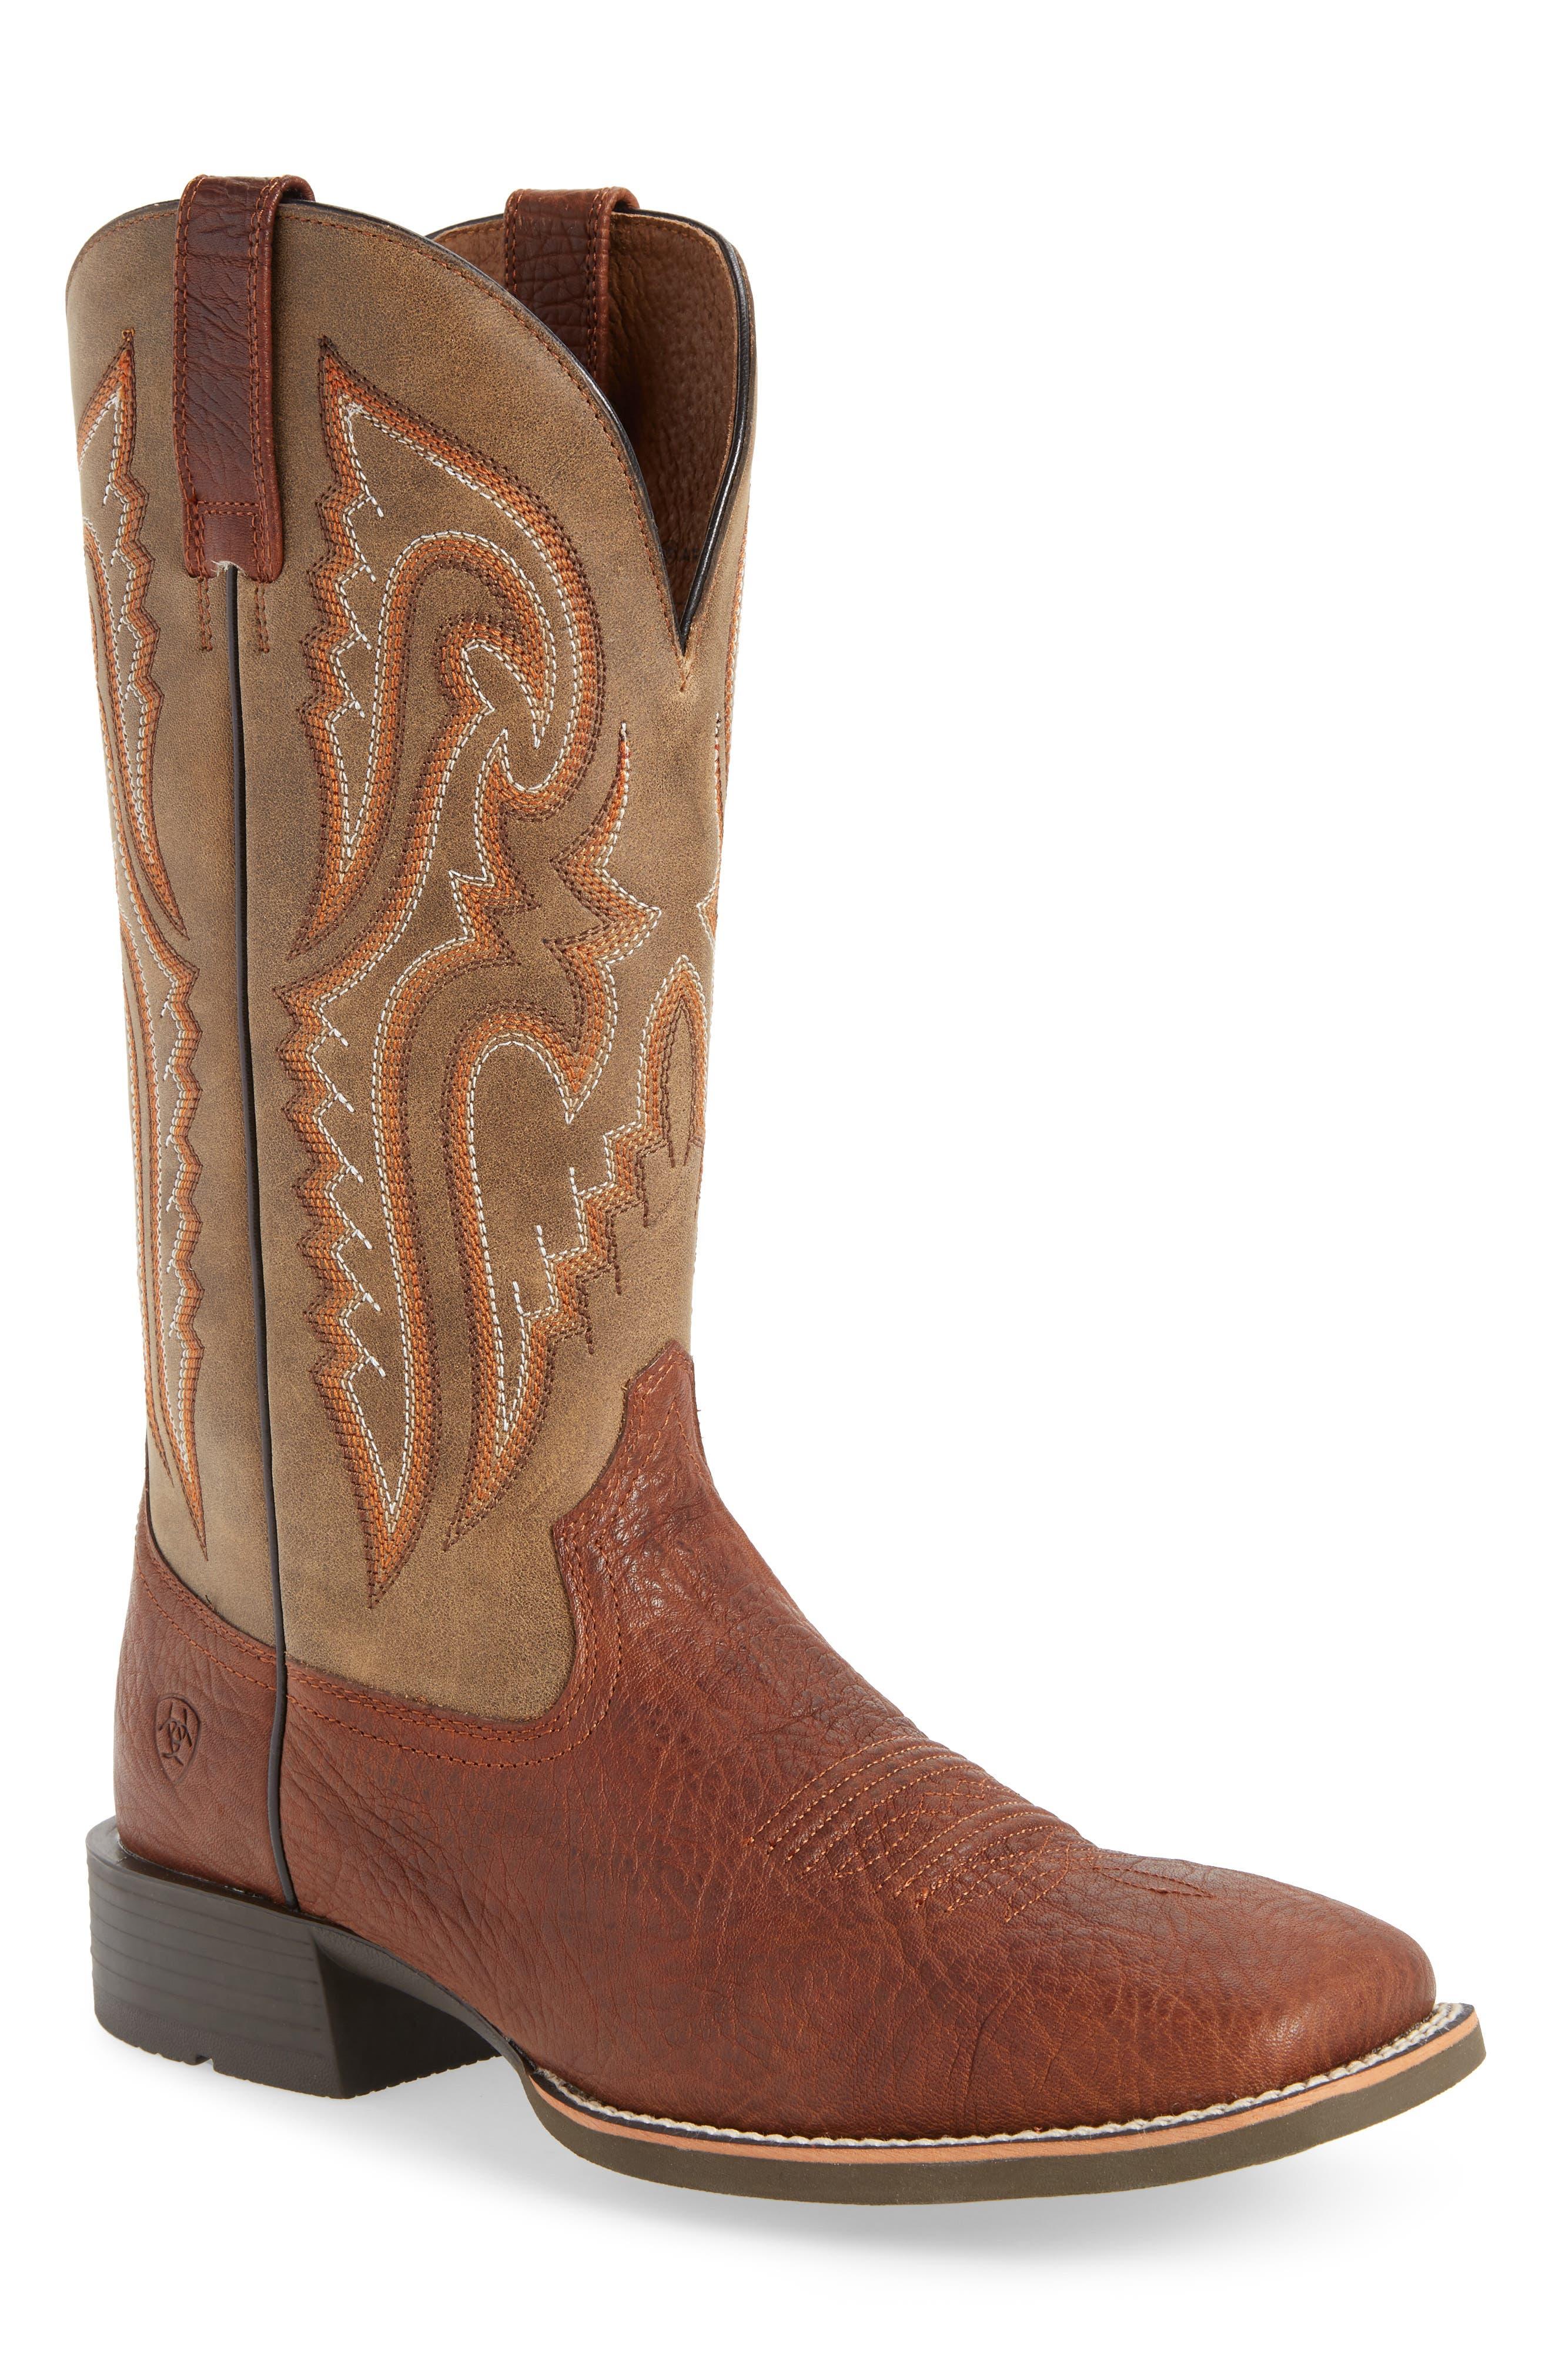 Ariat Heritage Latigo Square Toe Cowboy Boot, Brown